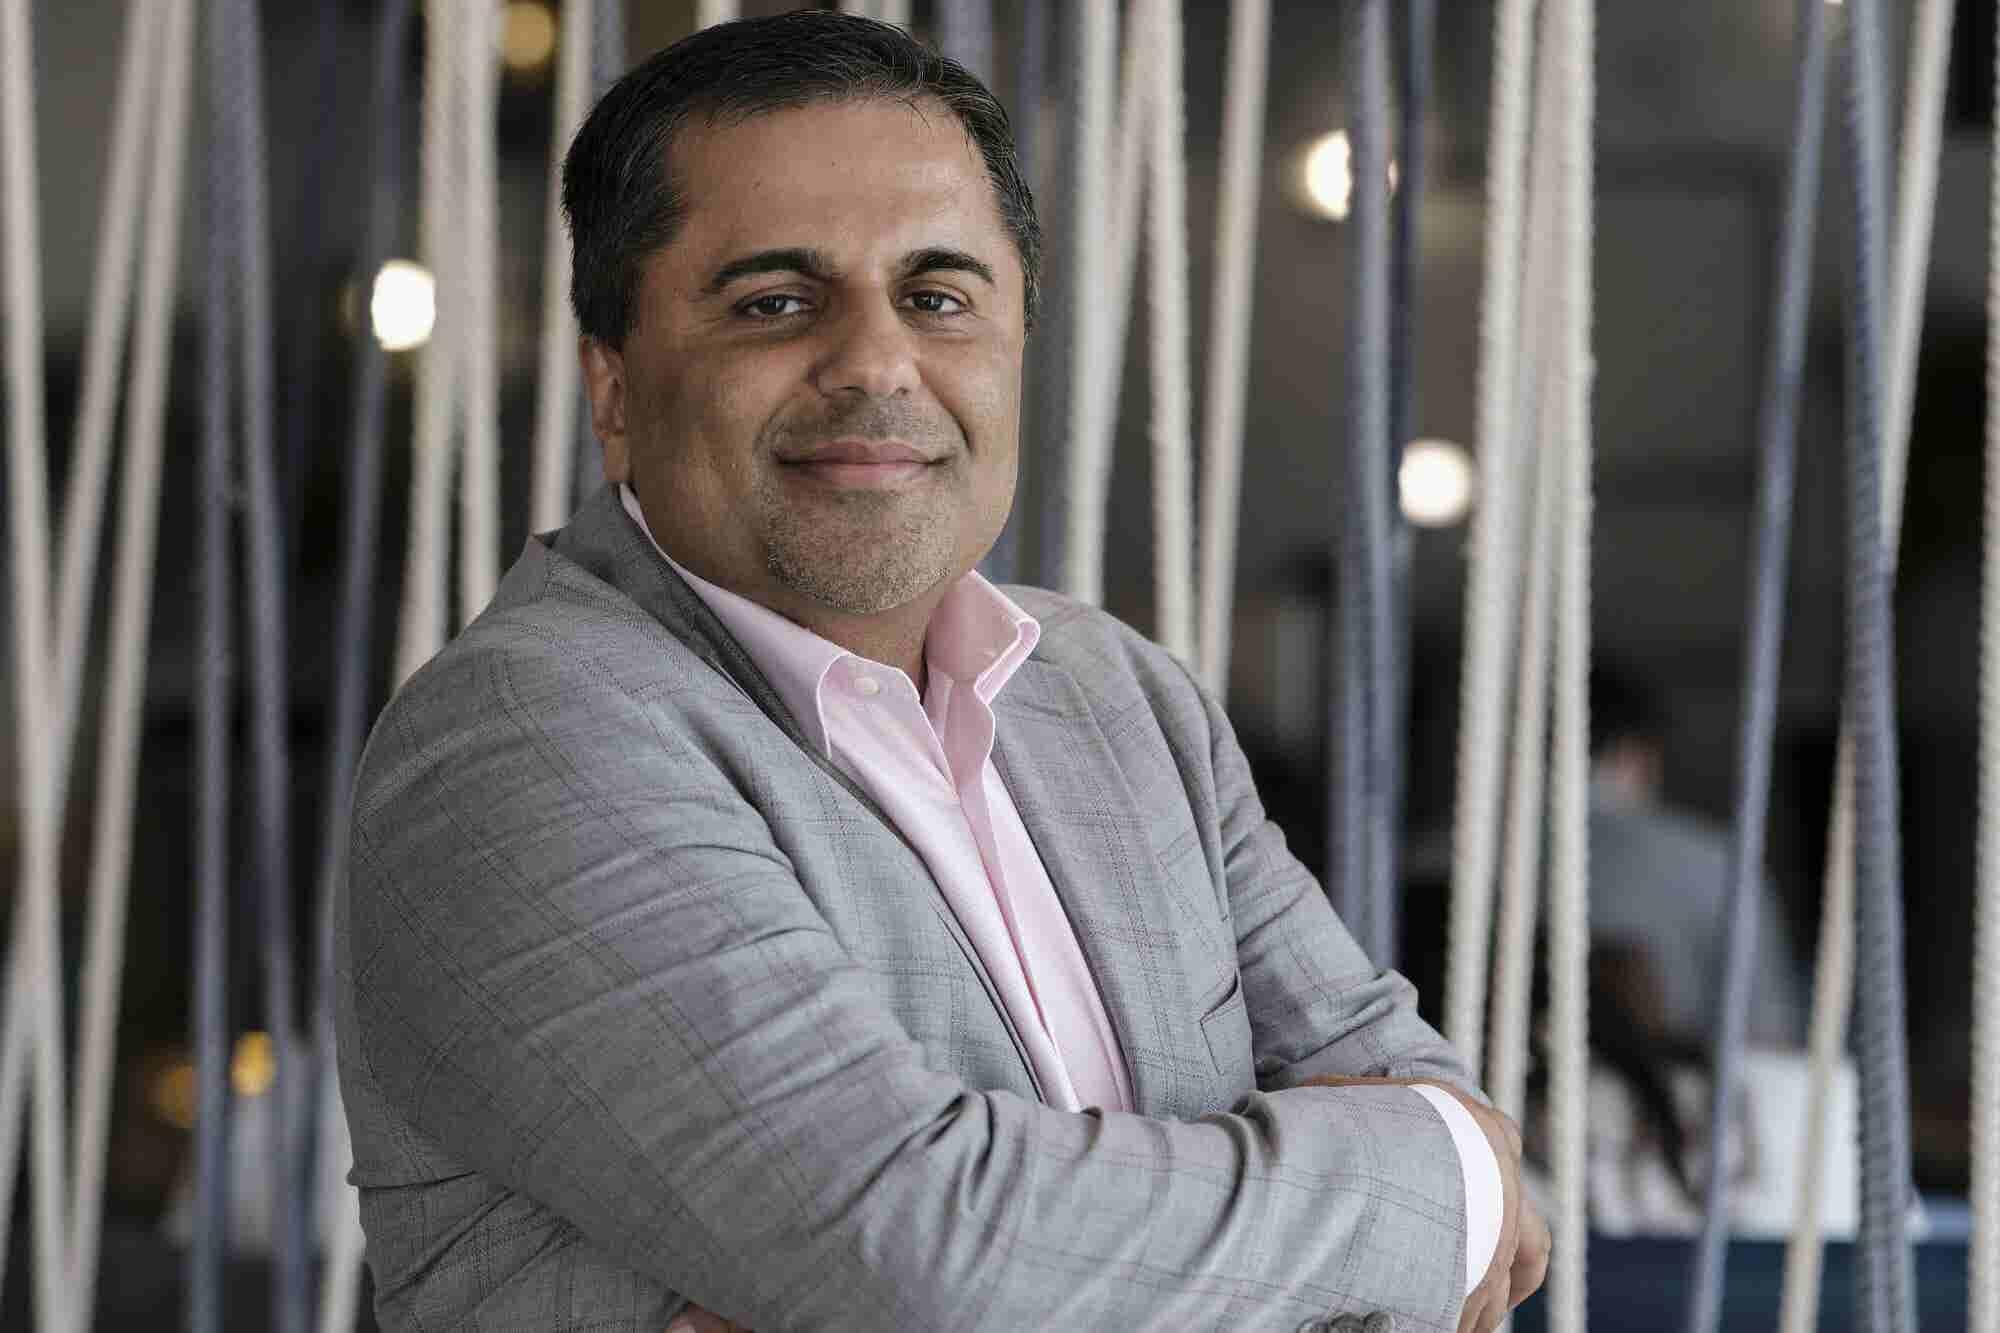 UAE-Based Fintech Startup Monami Tech Raises US$1 Million In Series A Round